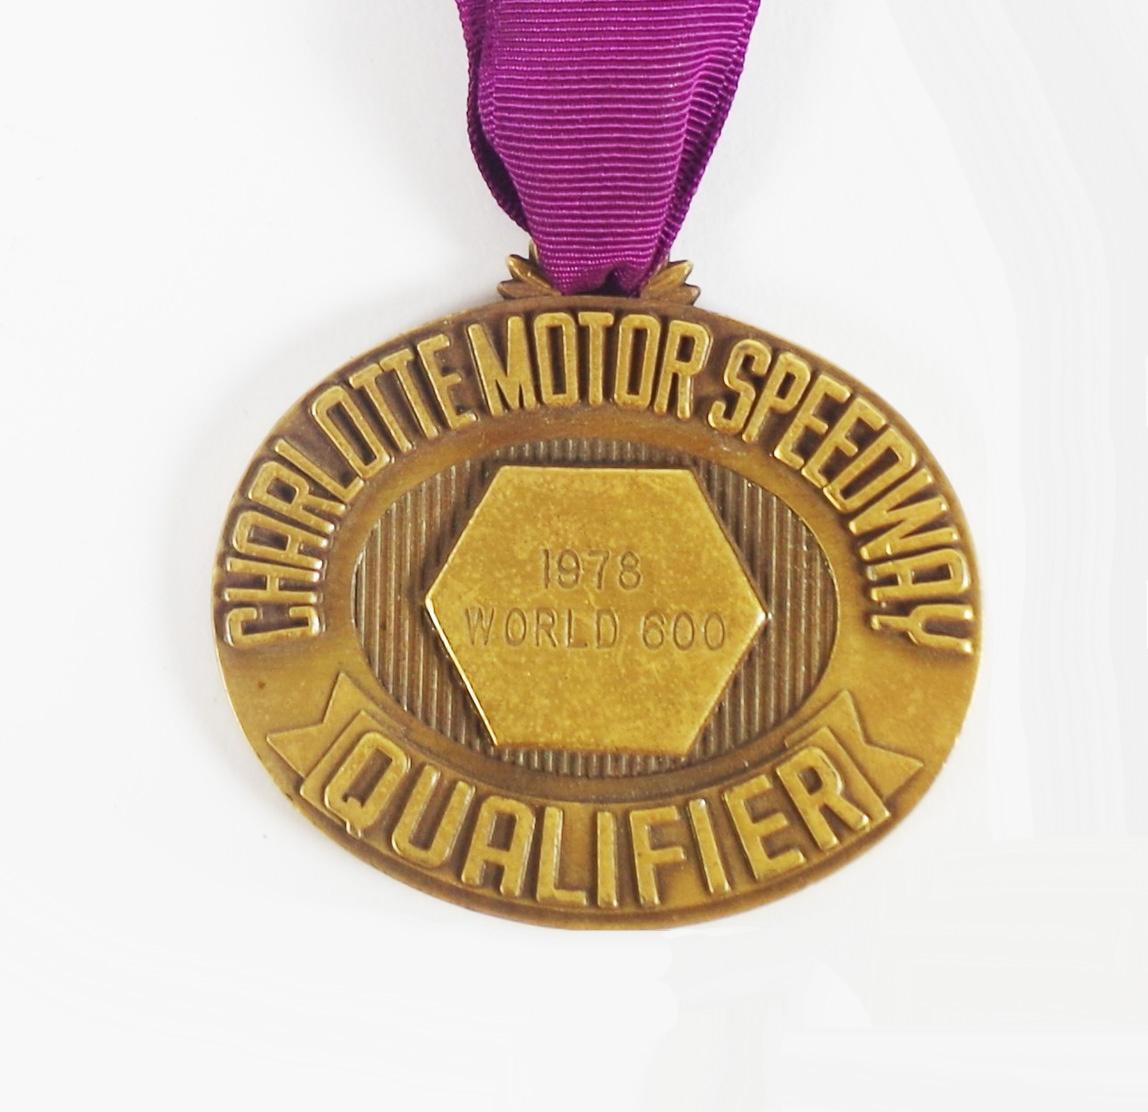 Artifact: Dale Earnhardt's 1978 Medal